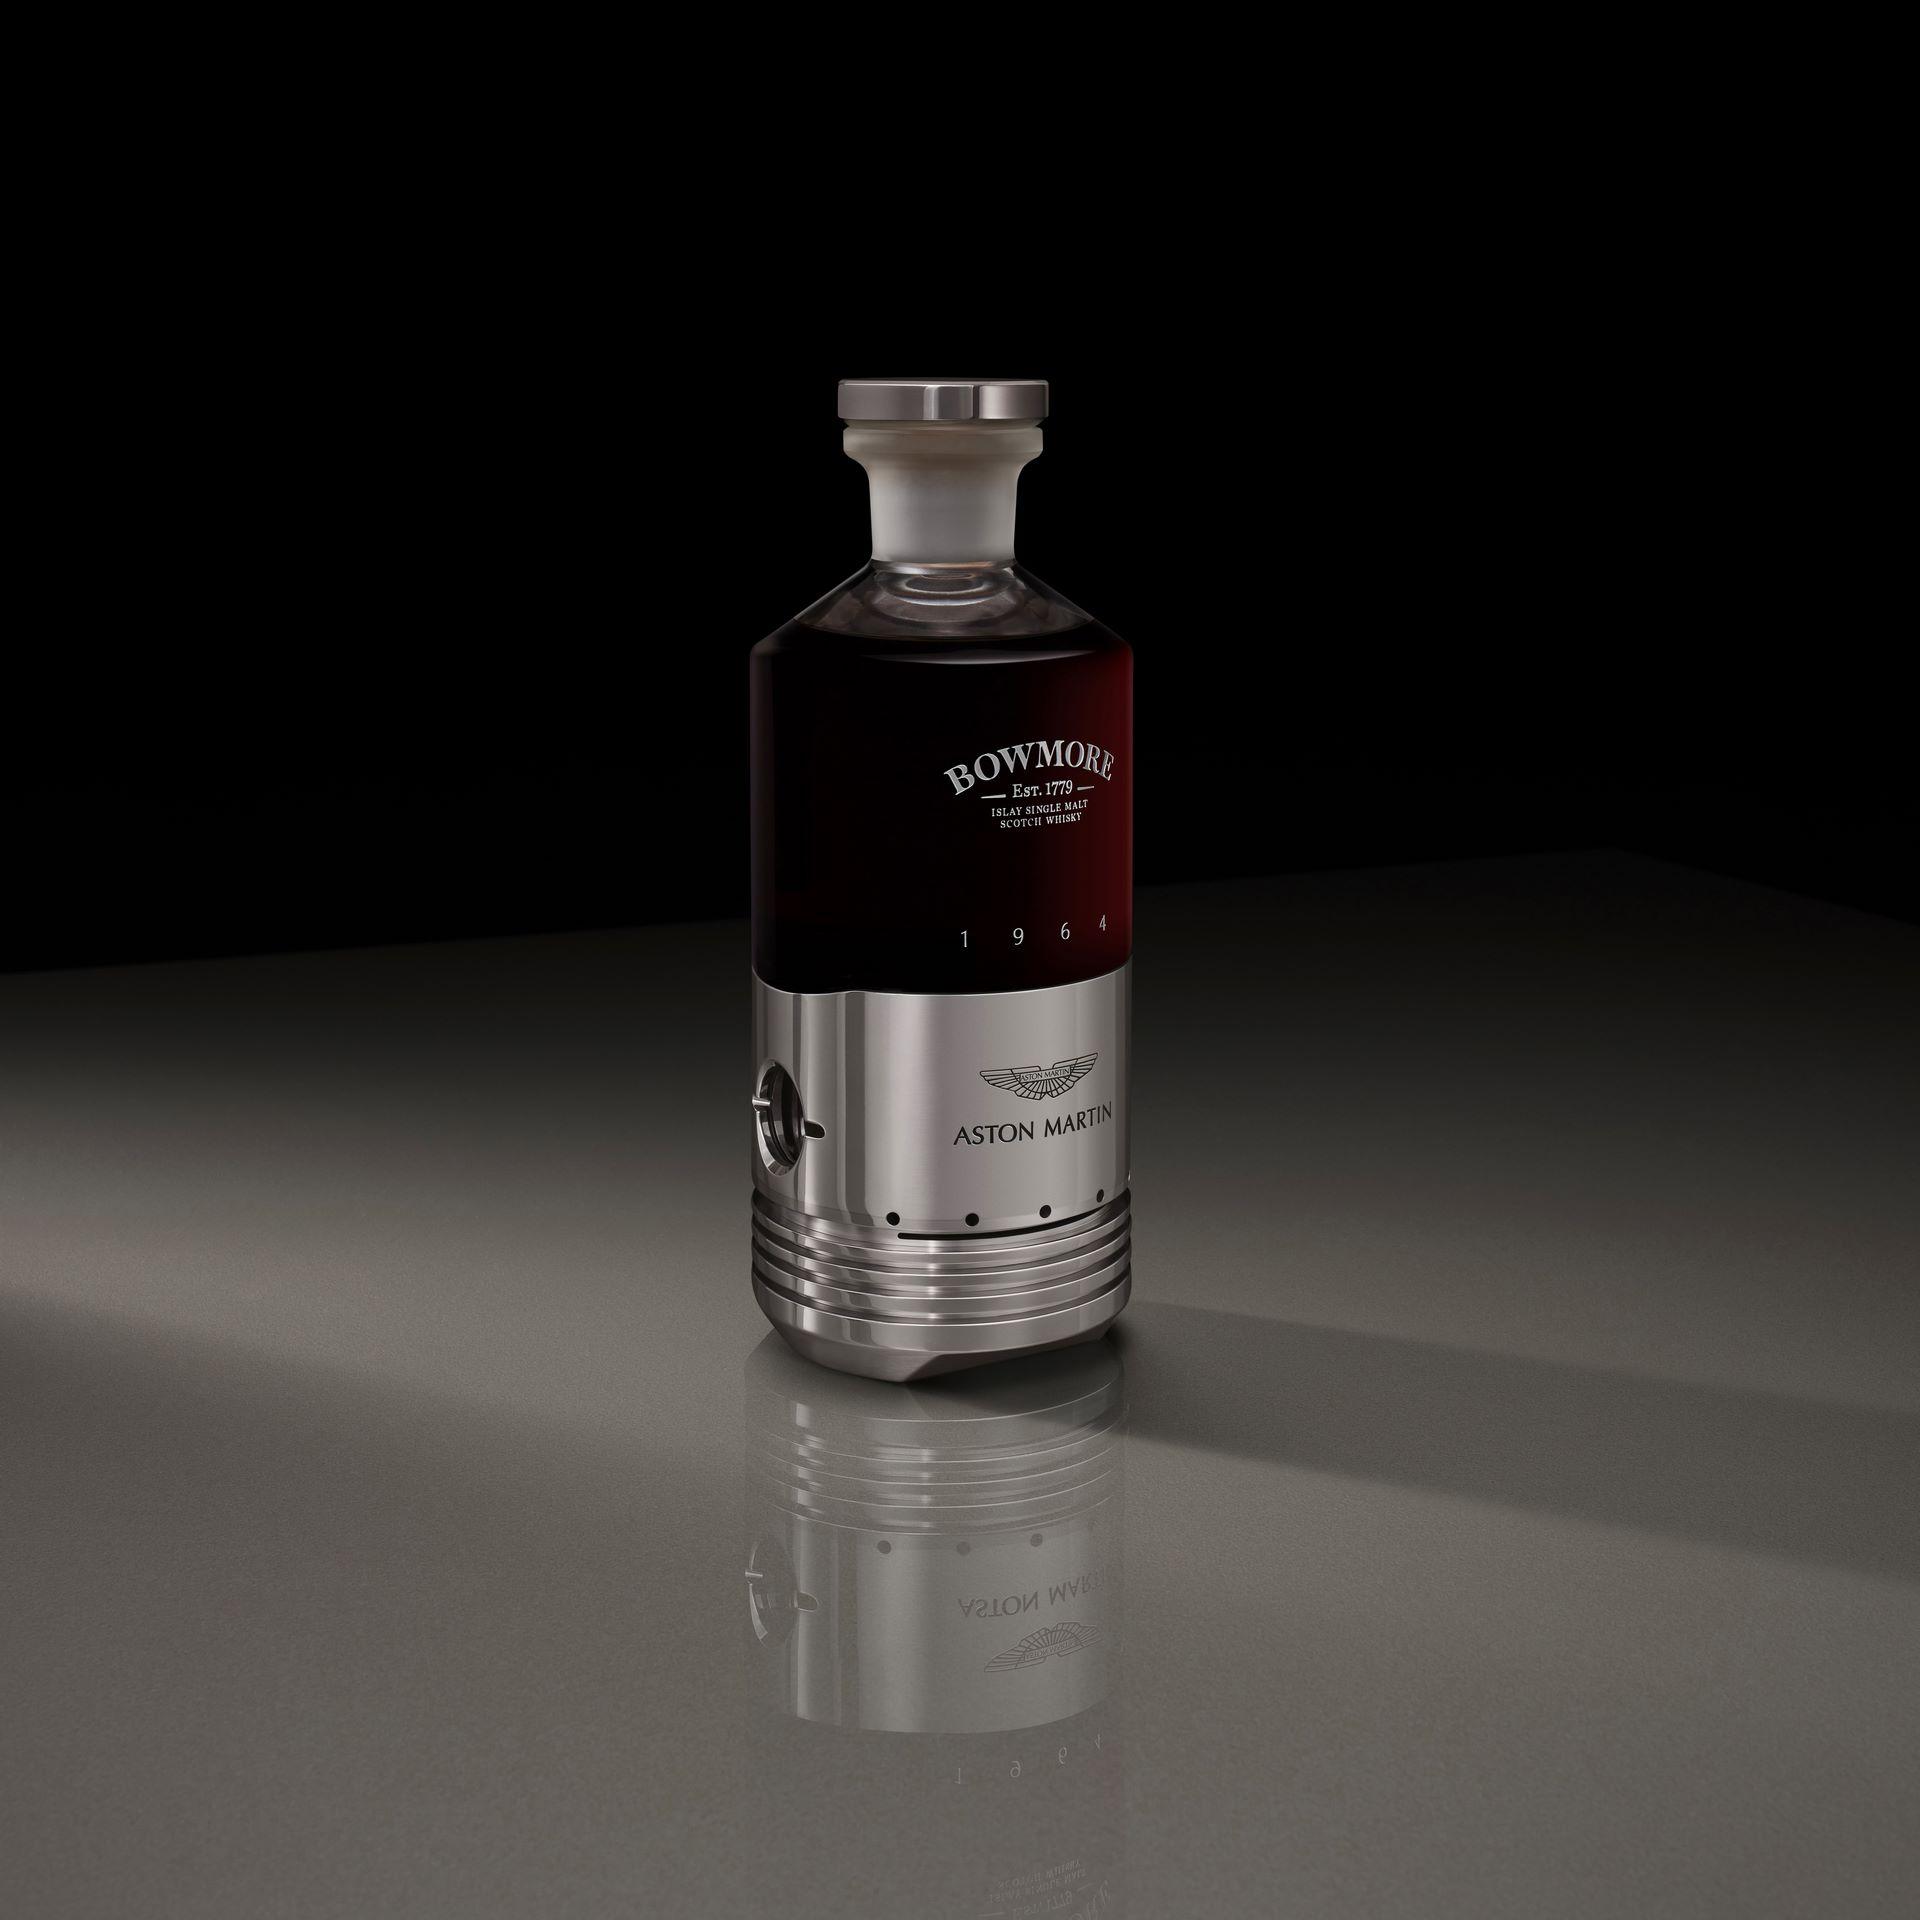 Black-Bowmore-Aston-Martin-DB5-1964-Whisky-4